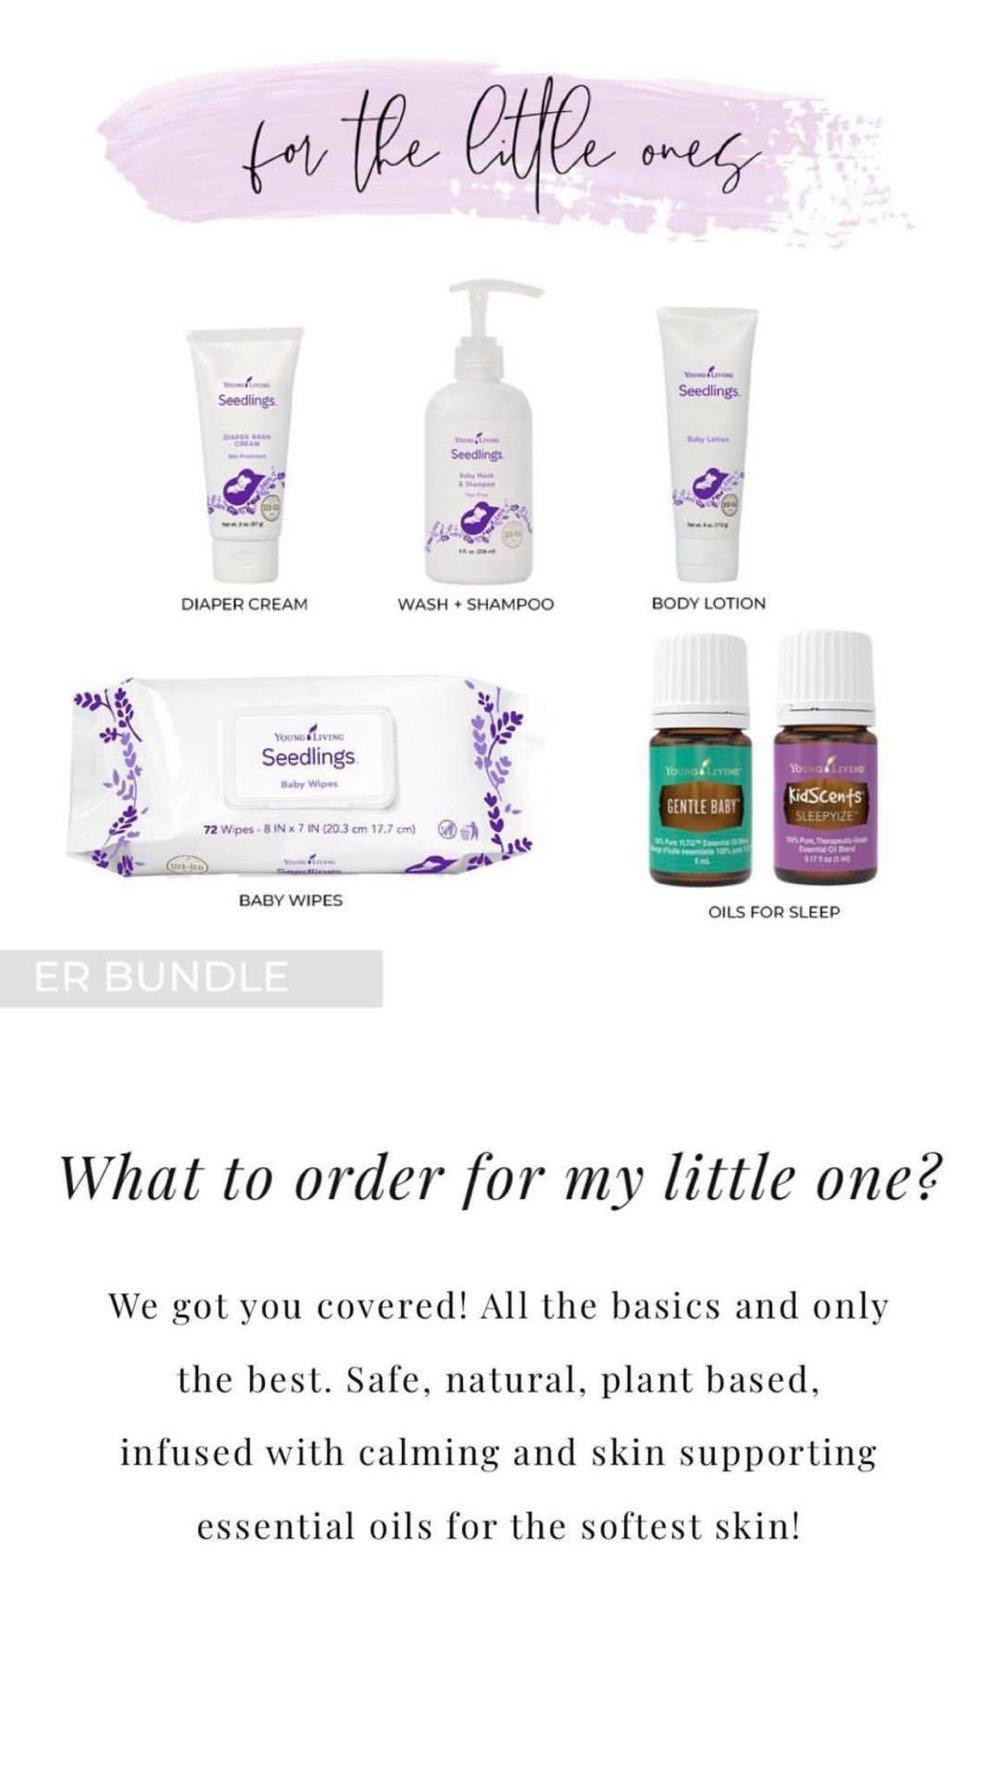 essential rewards kit - for the little ones.jpg